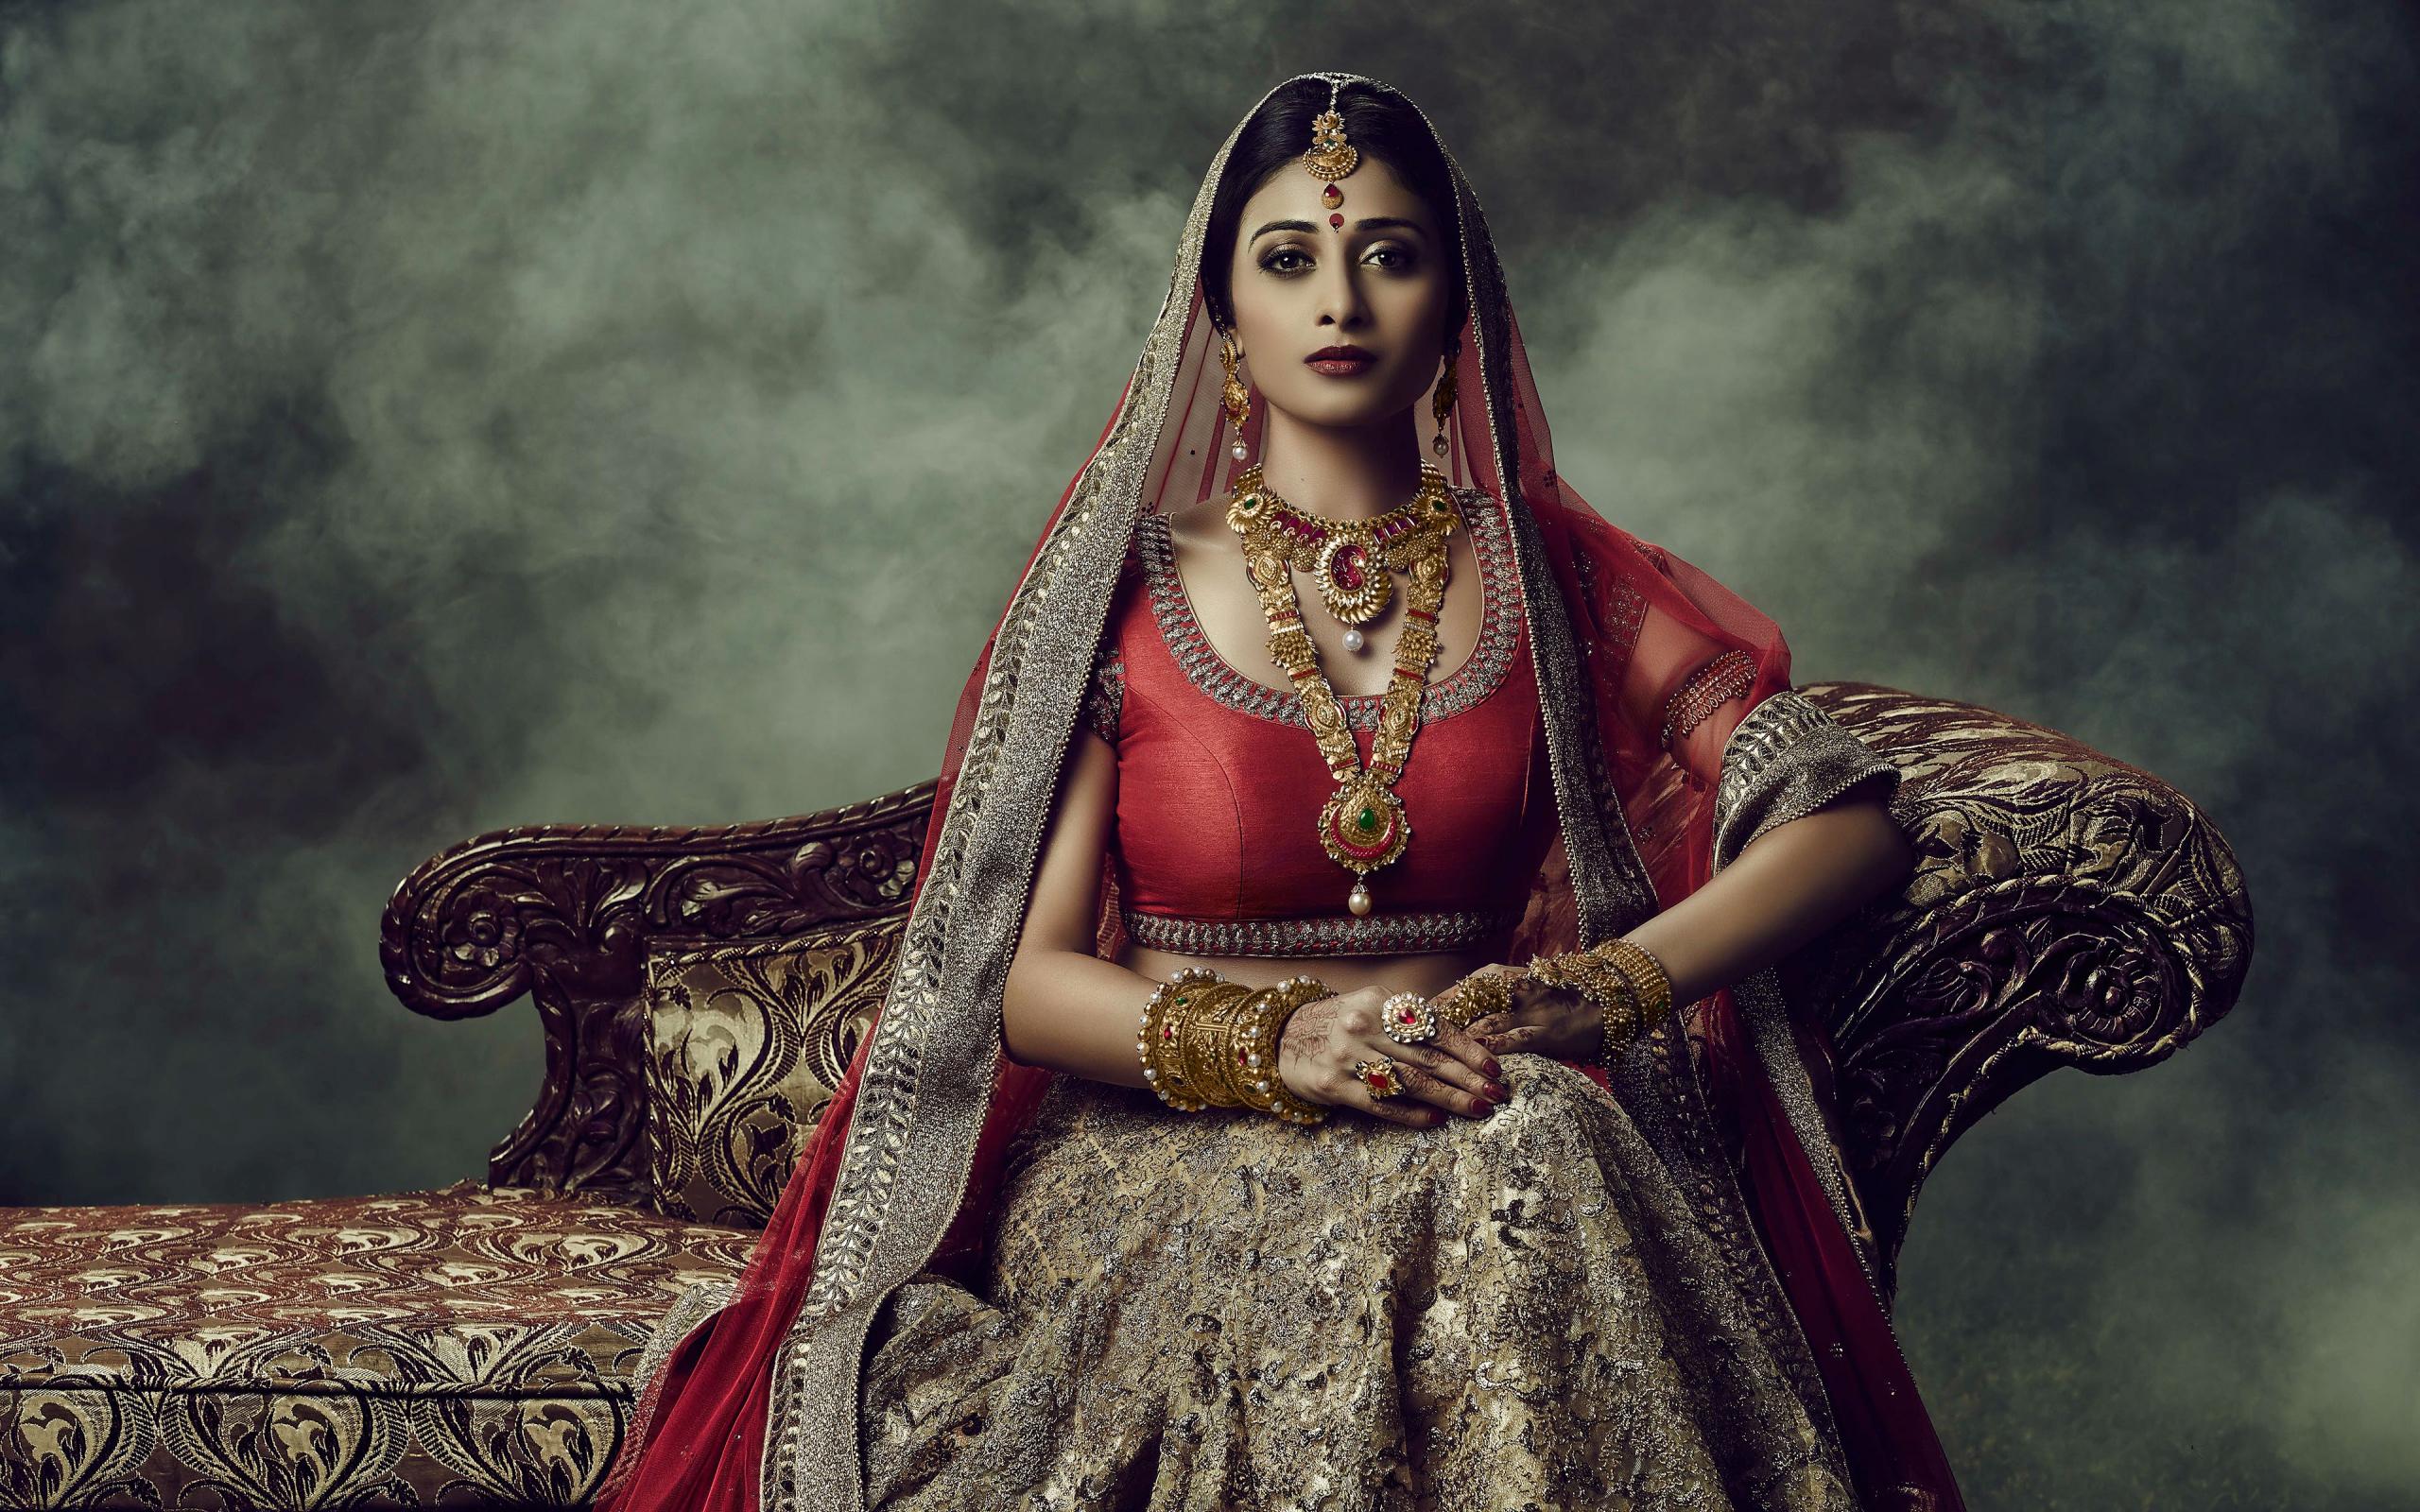 Desktop Wallpaper Indian Wedding Dress Girl Model Sofa Hd Image Picture Background 788ea5